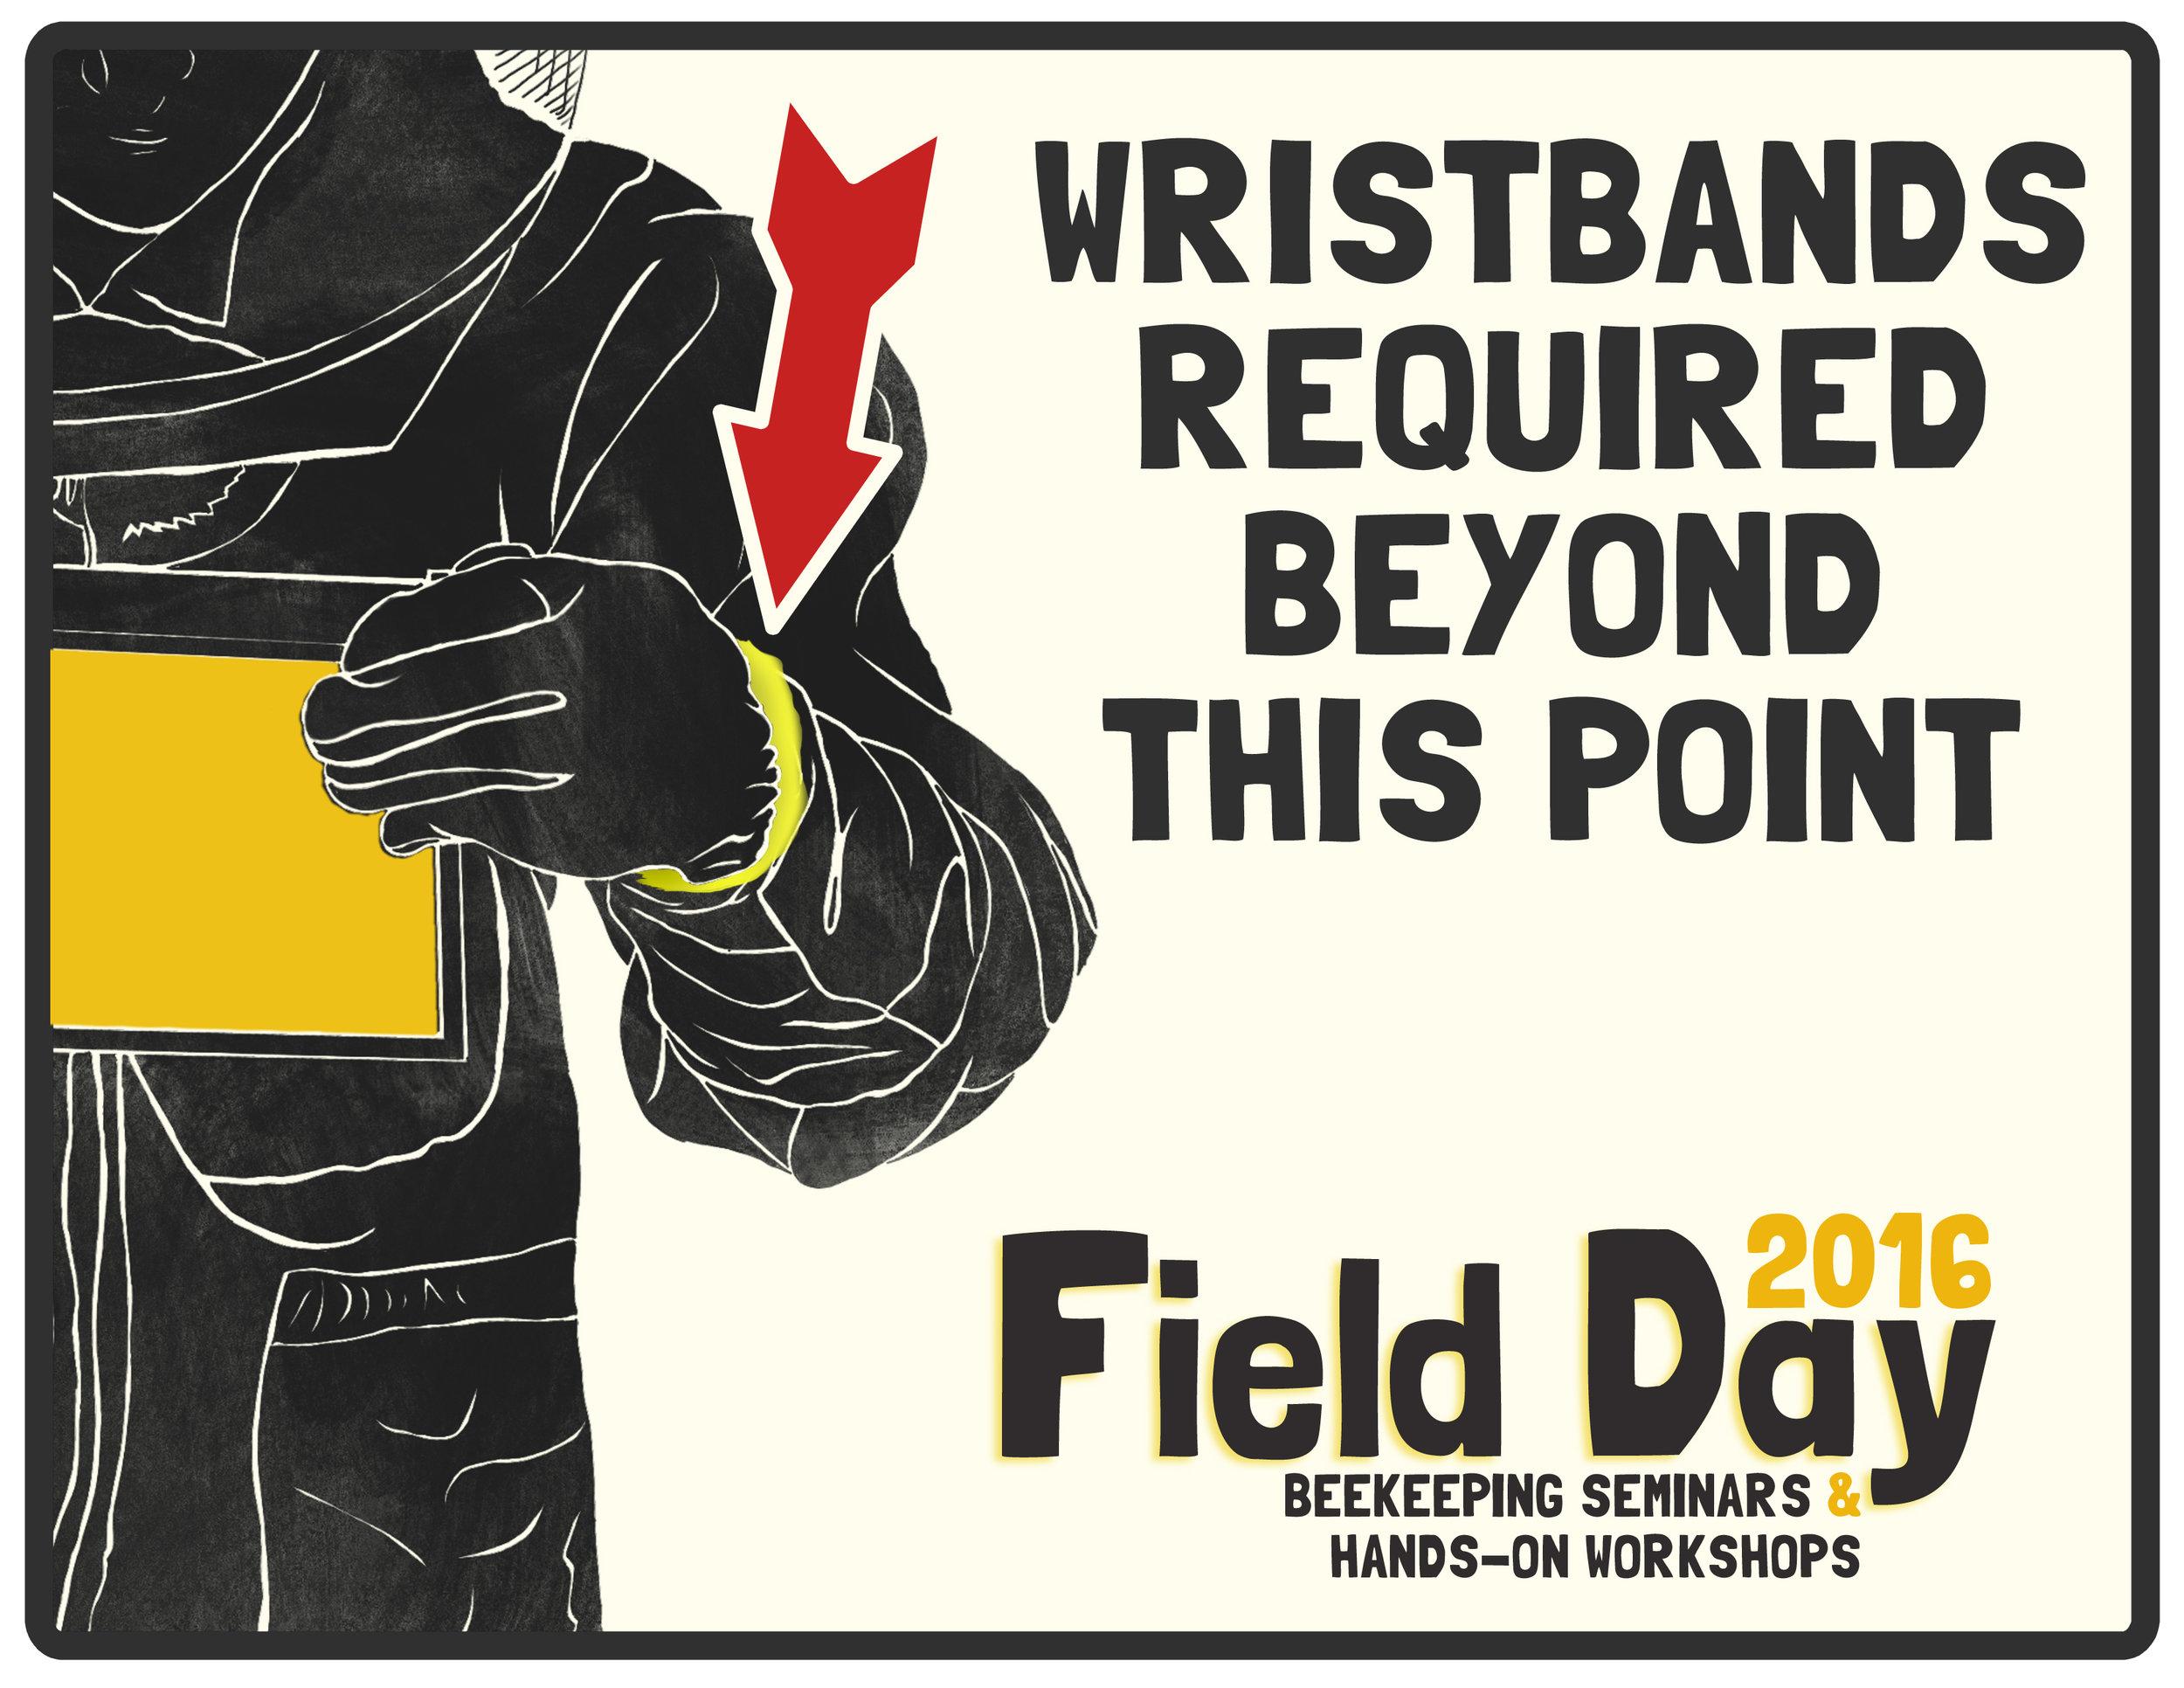 wristband_sign.jpg